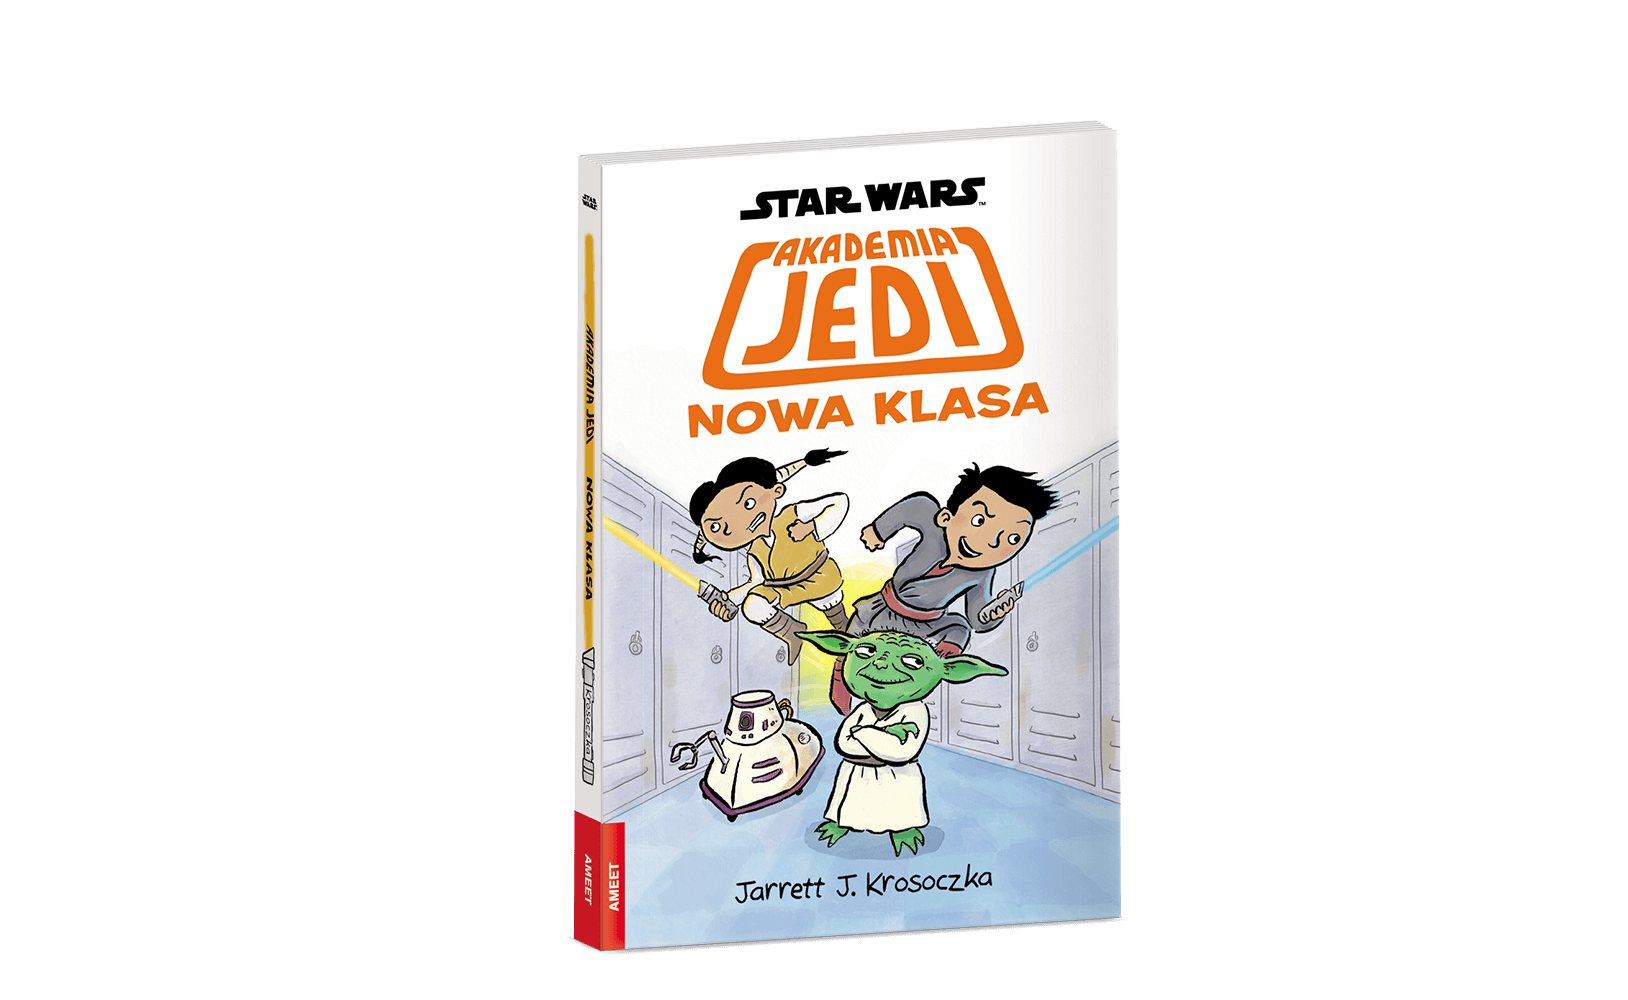 Star Wars™. Akademia Jedi. Nowa klasa